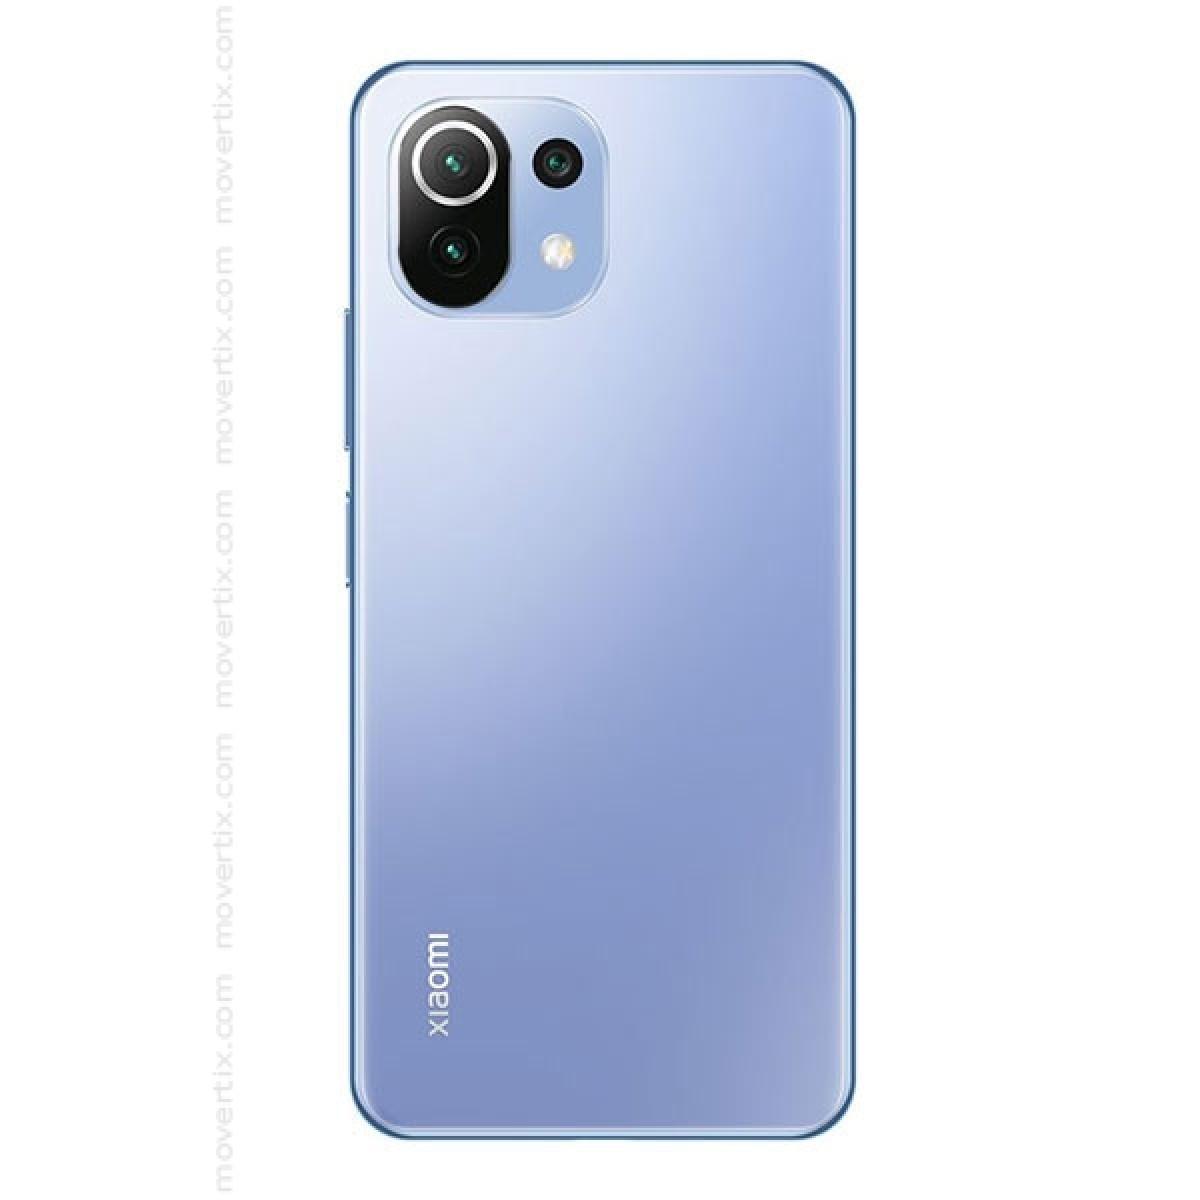 Xiaomi Mi 11 Lite Dual SIM Bubblegum Blue 128GB and 6GB RAM (6934177732676)